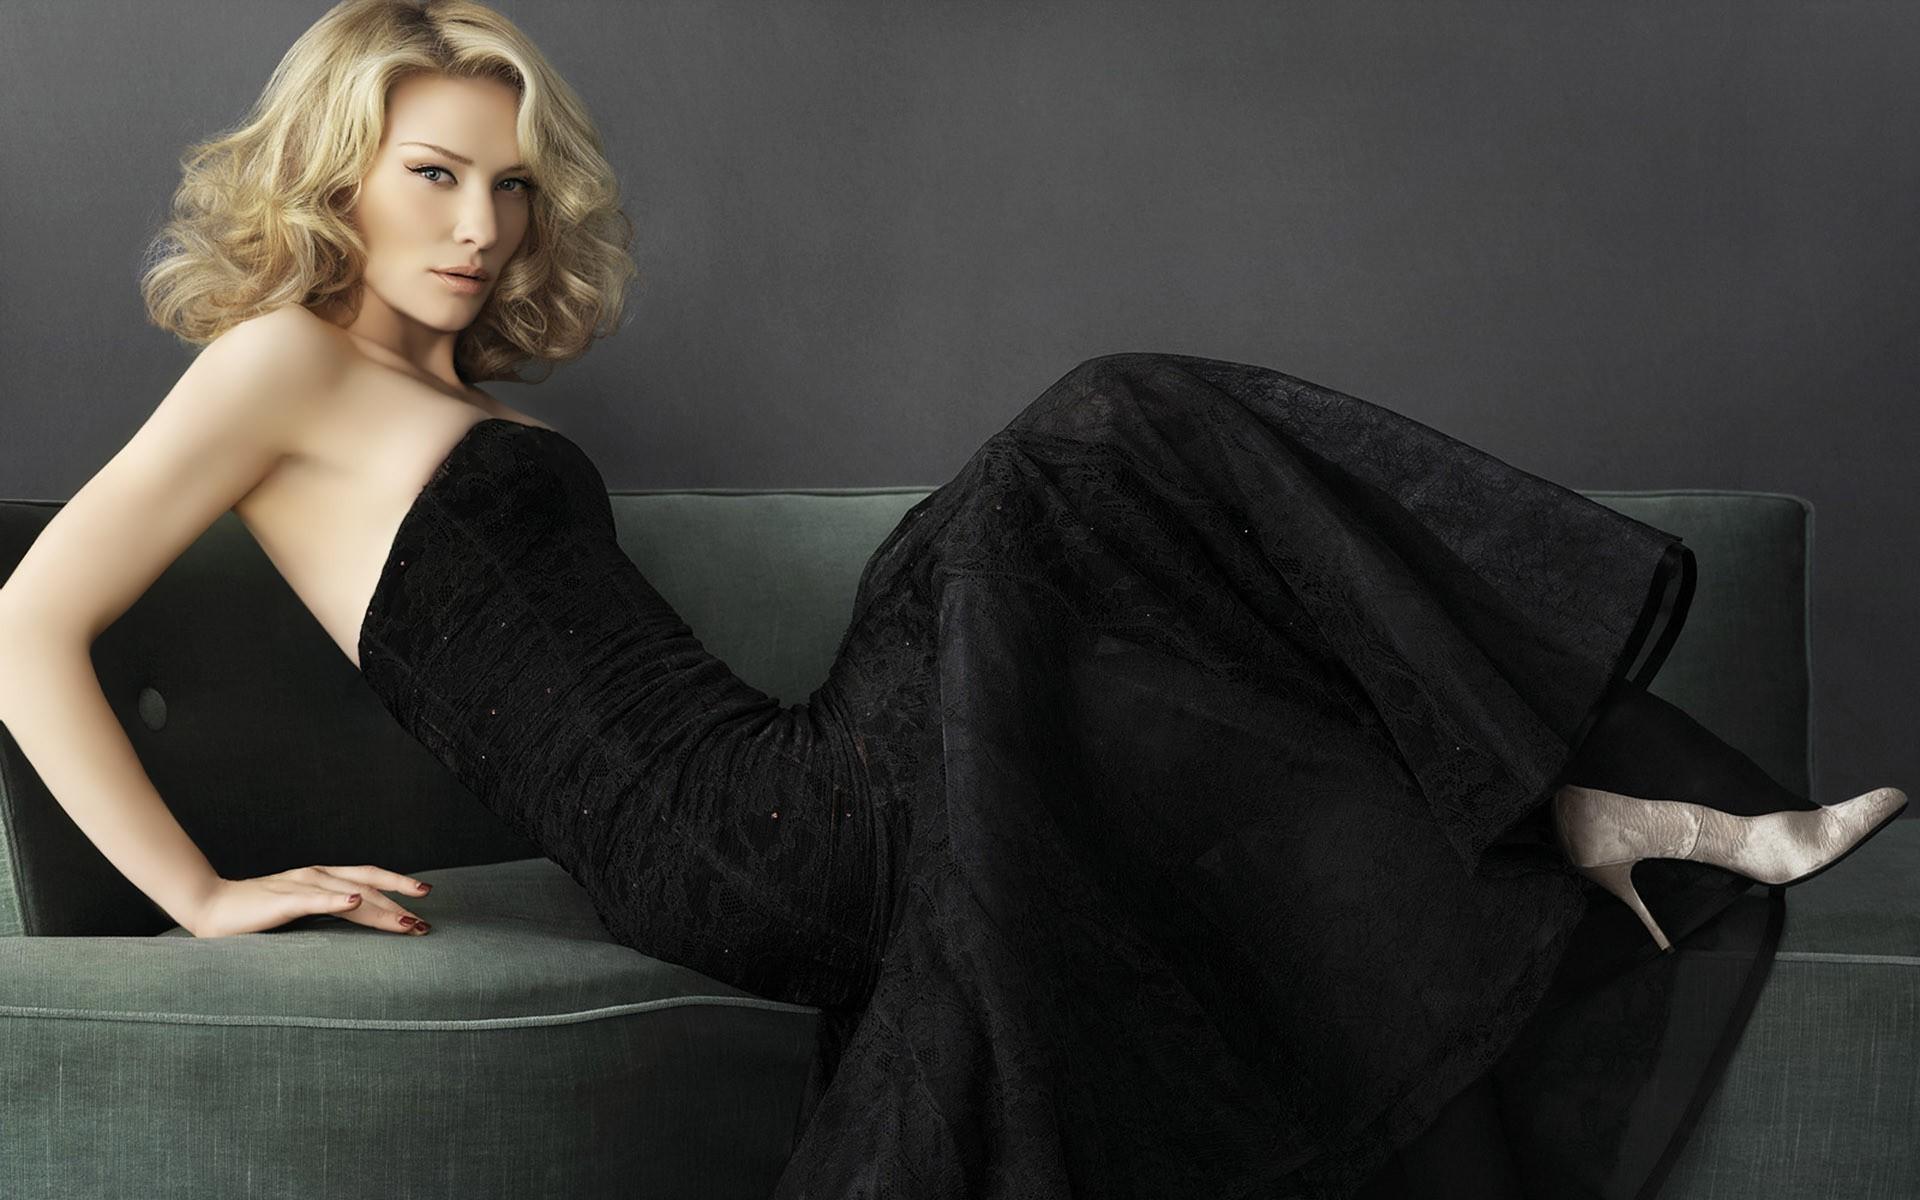 Complete Black Wallpaper 18 Hd Cate Blanchett Wallpapers